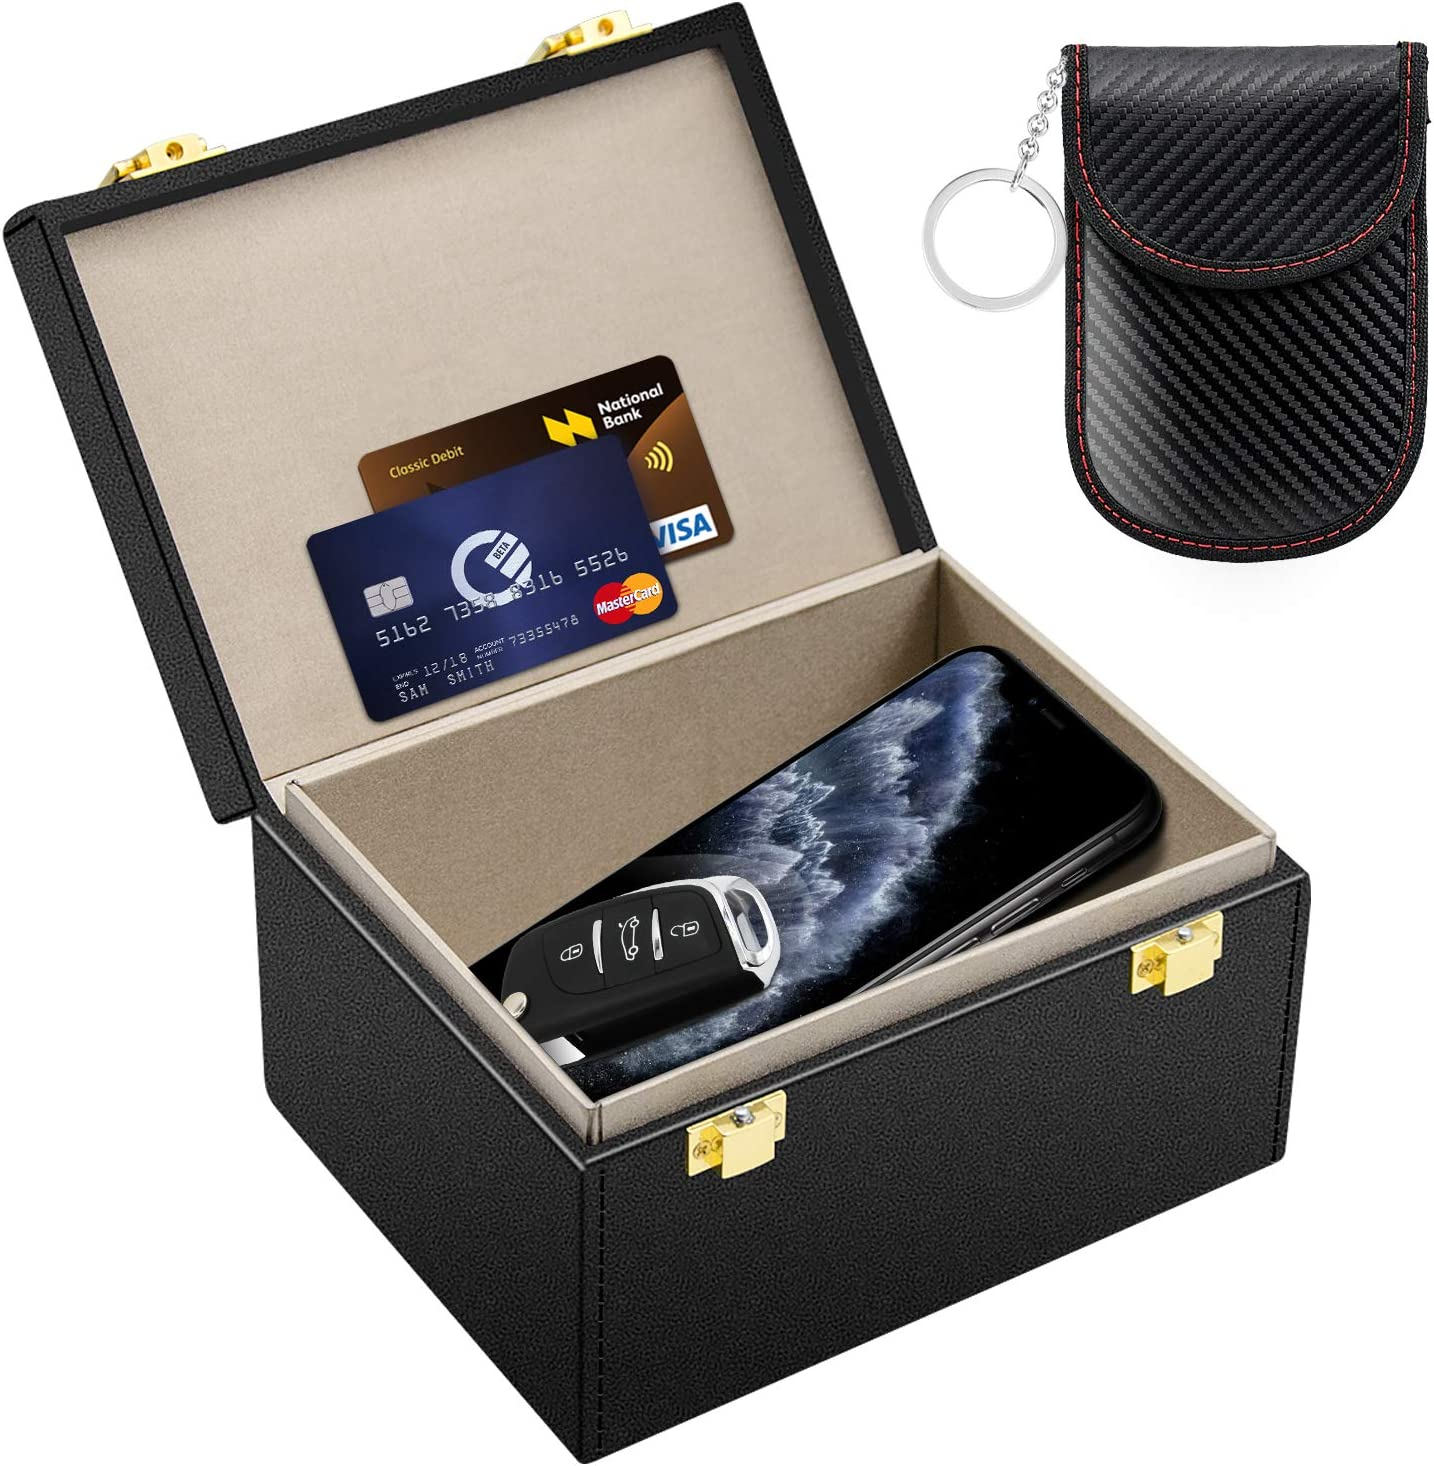 Kolaura Faraday Box for Car Keys, Signal Blocker, Car Key Signal Blocker Box with Car Security Key Pouch, RFID Blocking Key Box for Phone Call, Cards, Anti-Theif Keyless Box